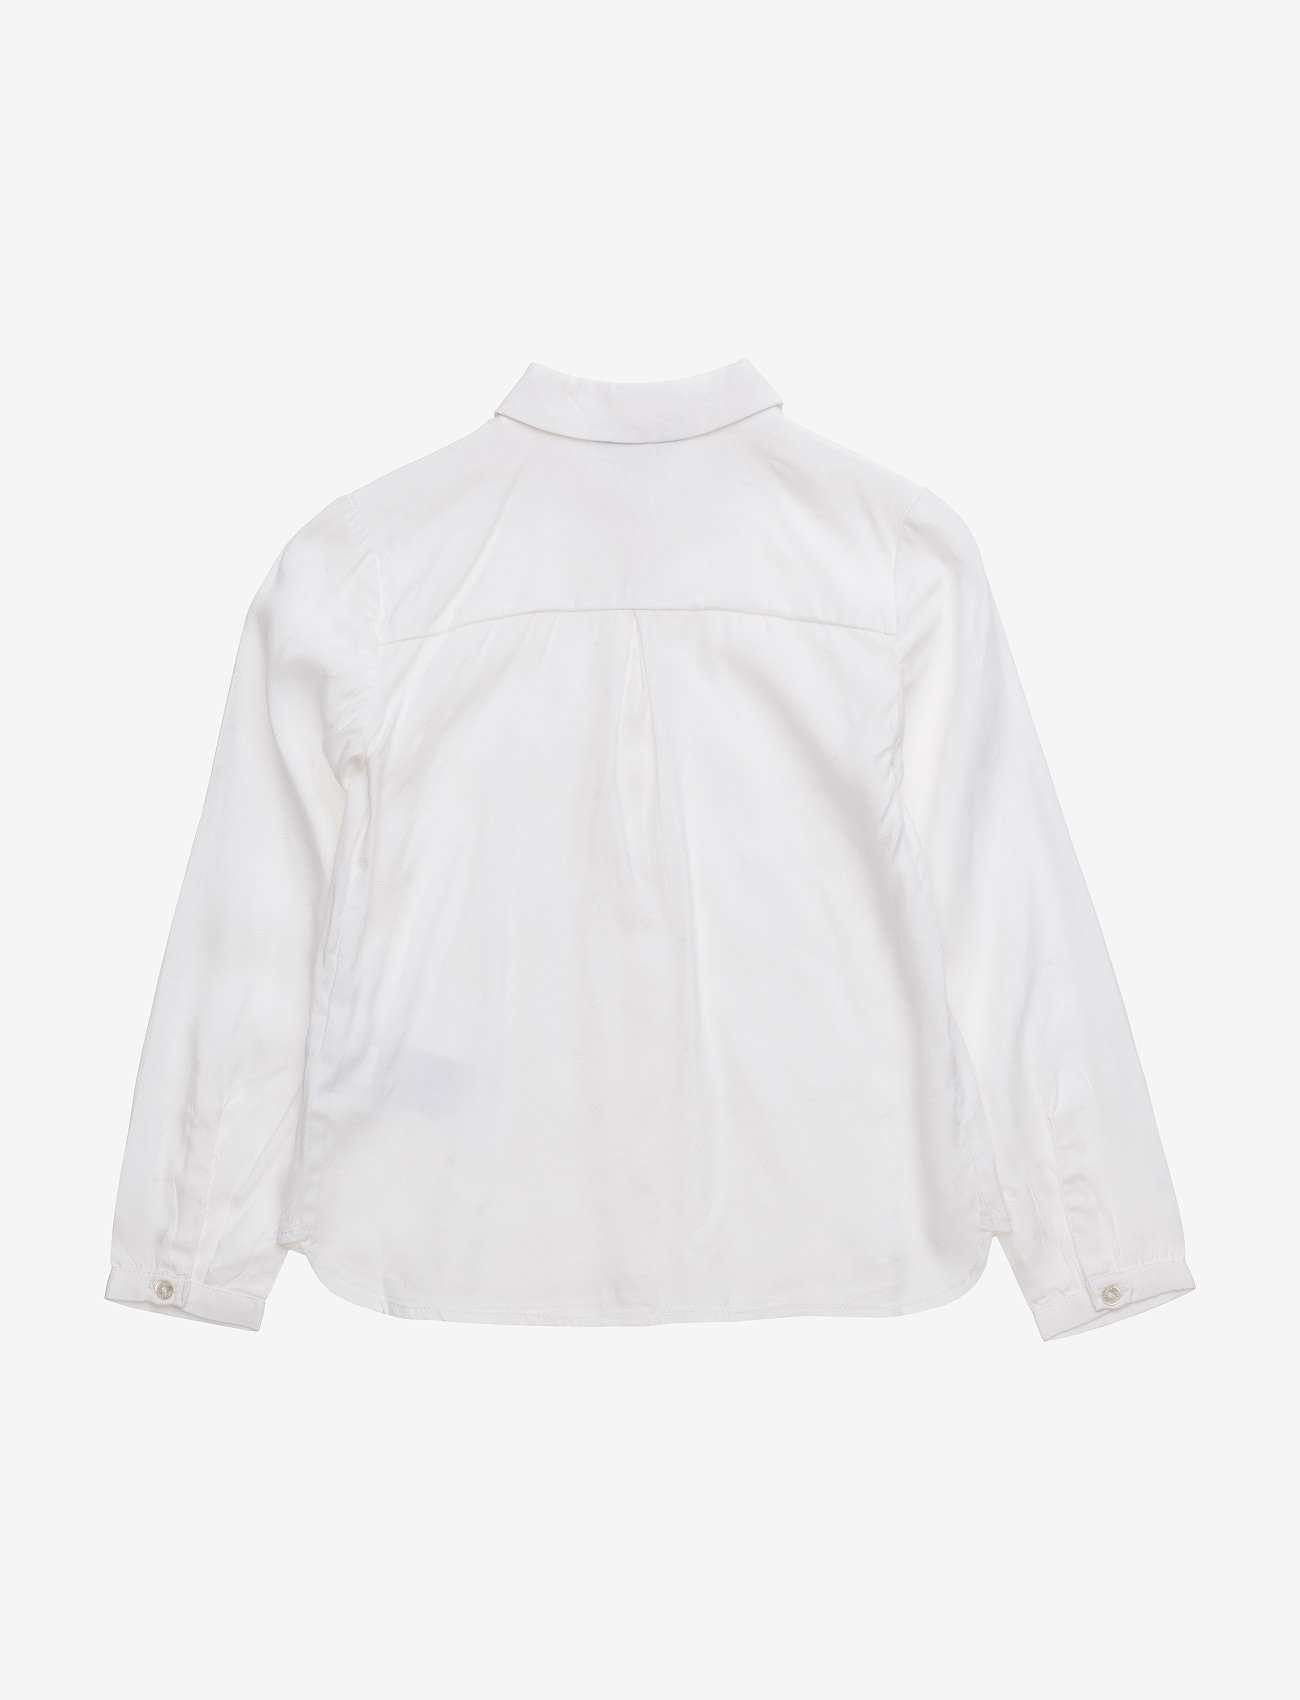 Tommy Hilfiger - STAR JACQUARD MINI TOP  L/S - shirts - white - 1